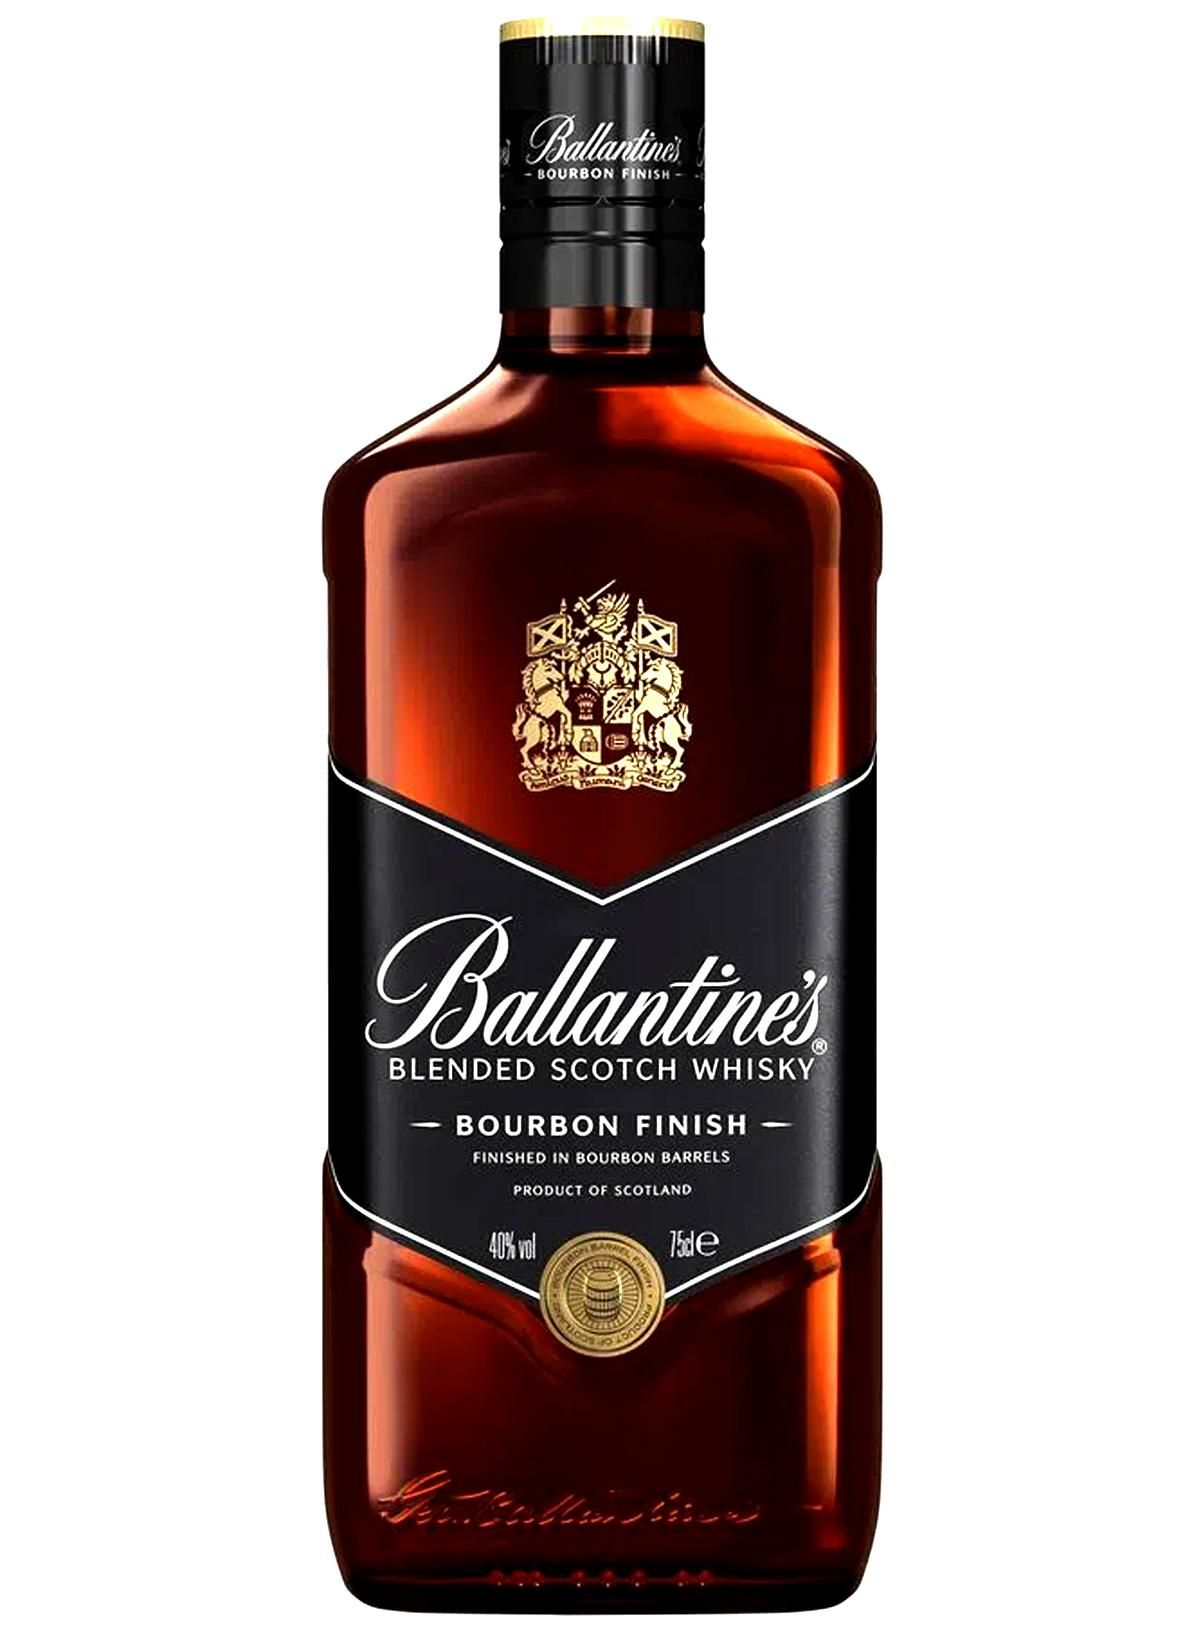 WHISKY BALLANTINES BOURBON FINISH 750ML